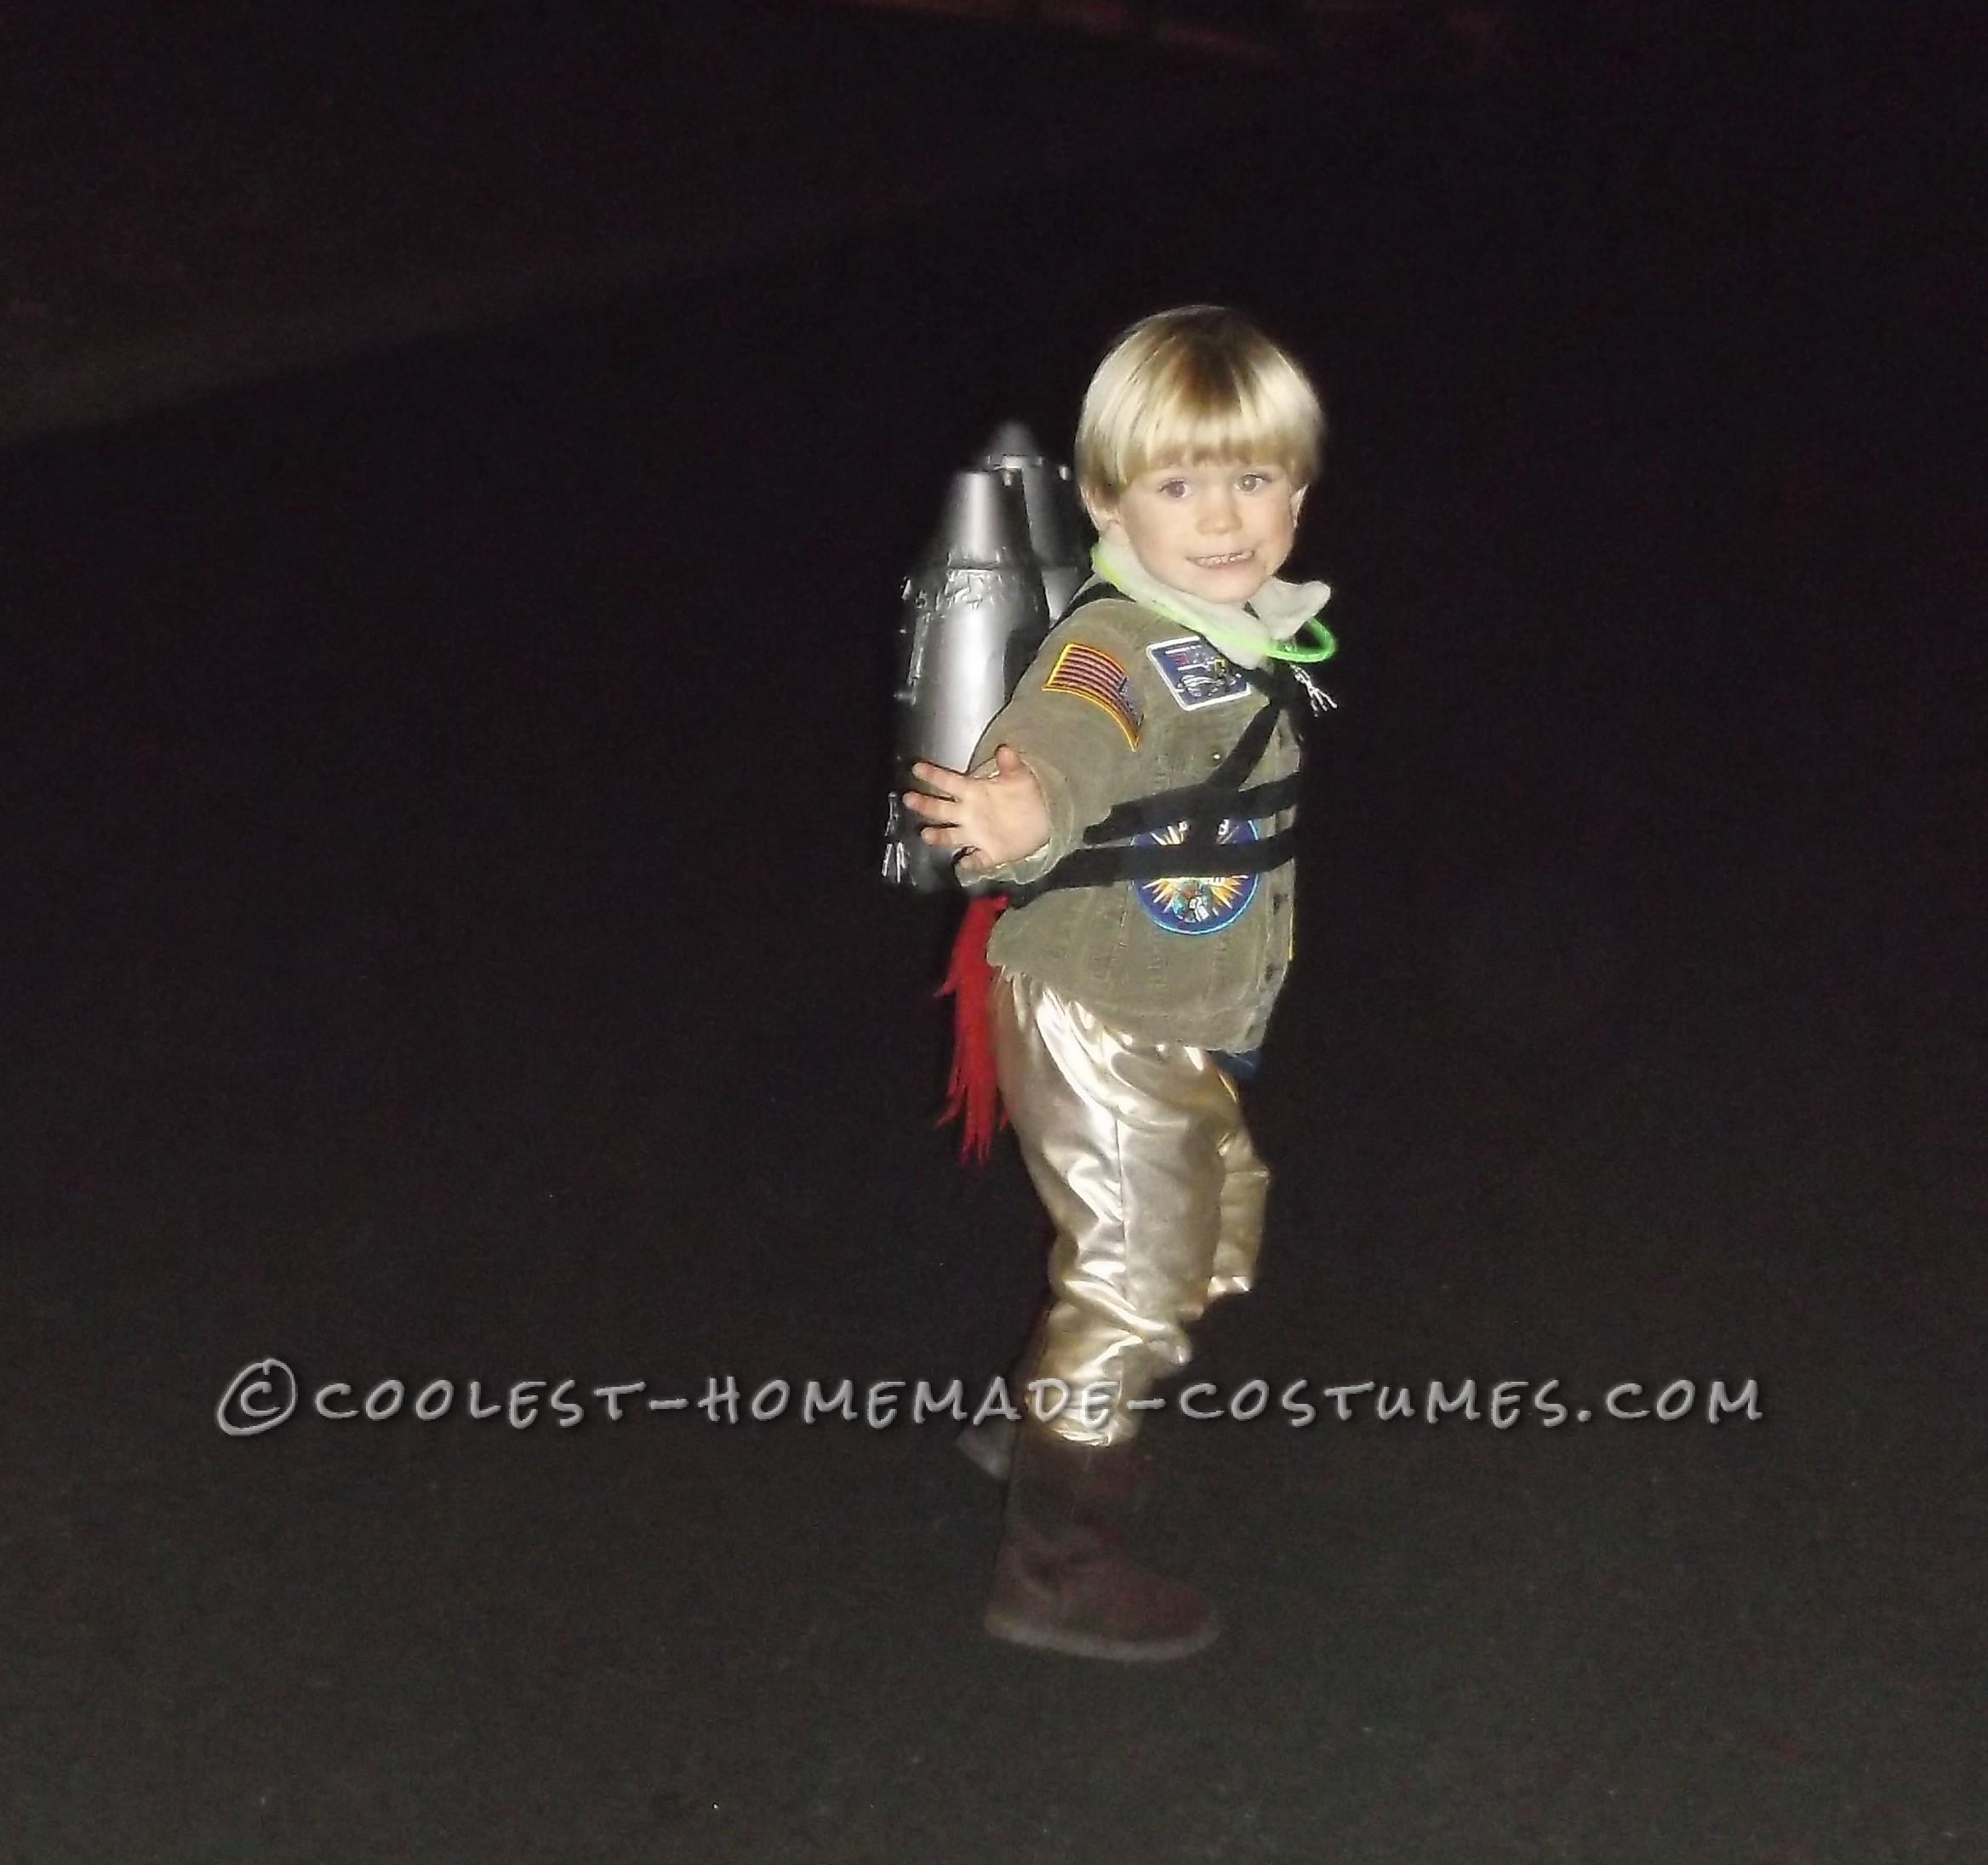 Cool DIY Rocket Man Costume for 3-Year-Old Boy